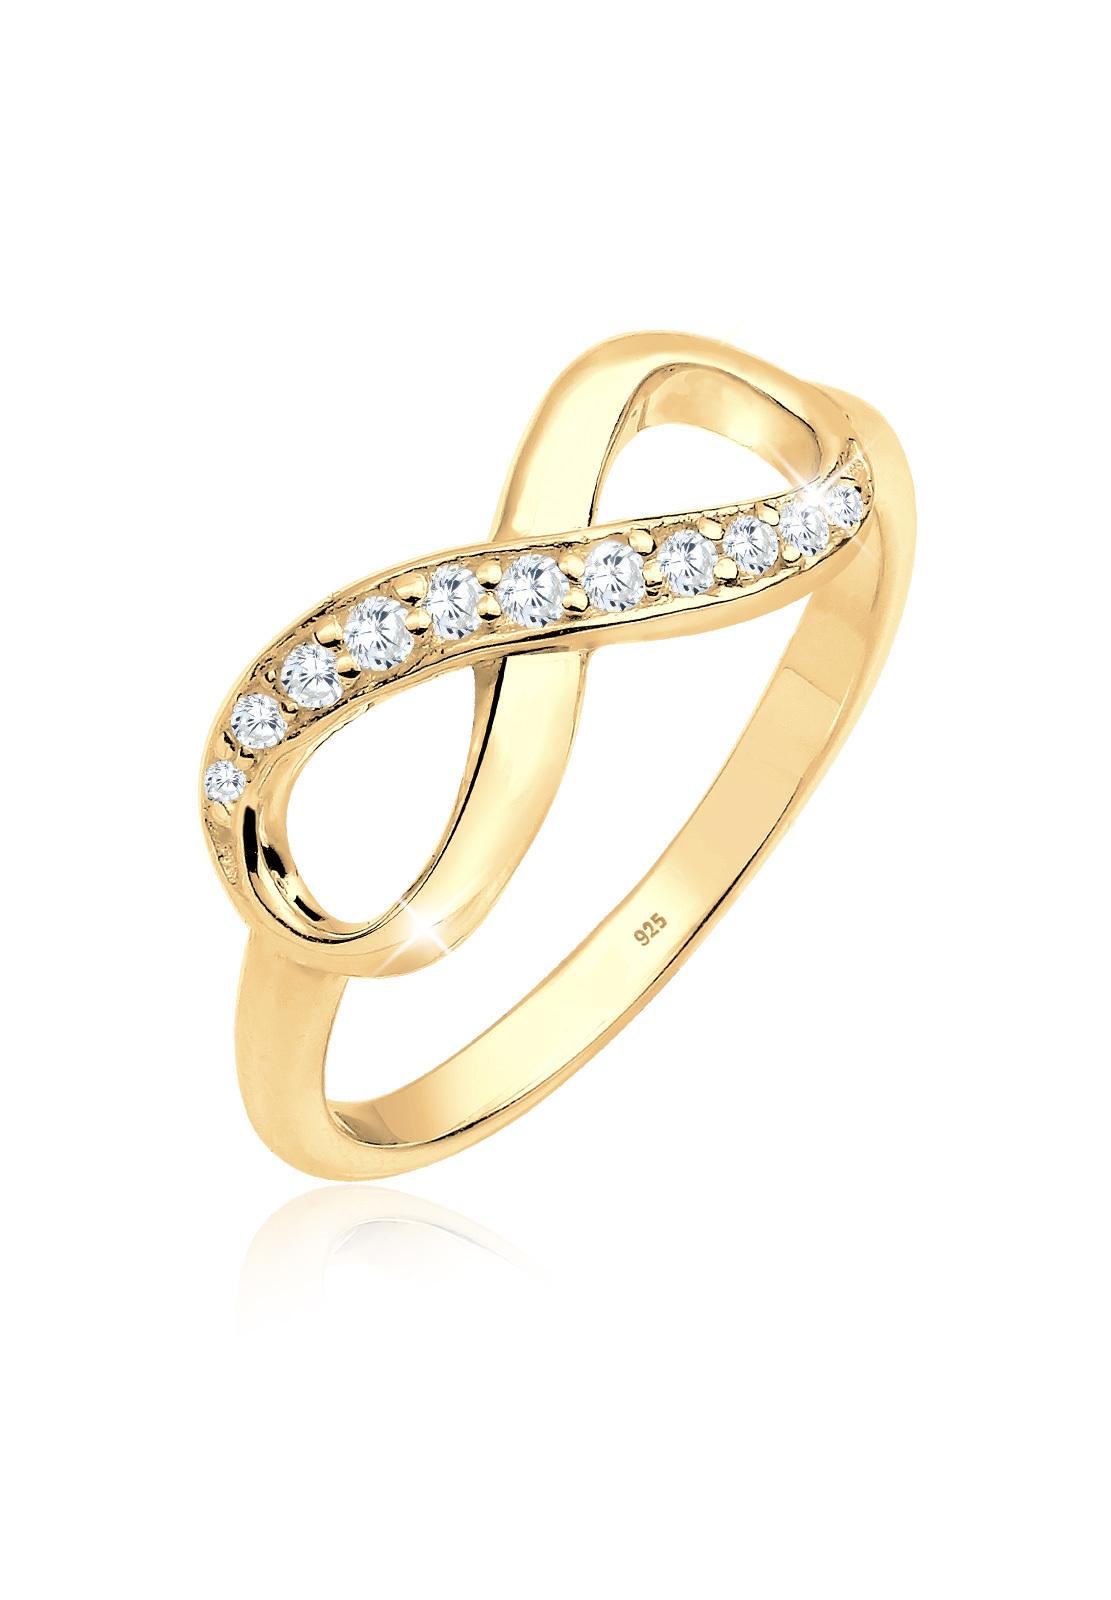 Ring Infinity   Zirkonia ( Weiß )   925er Sterling Silber